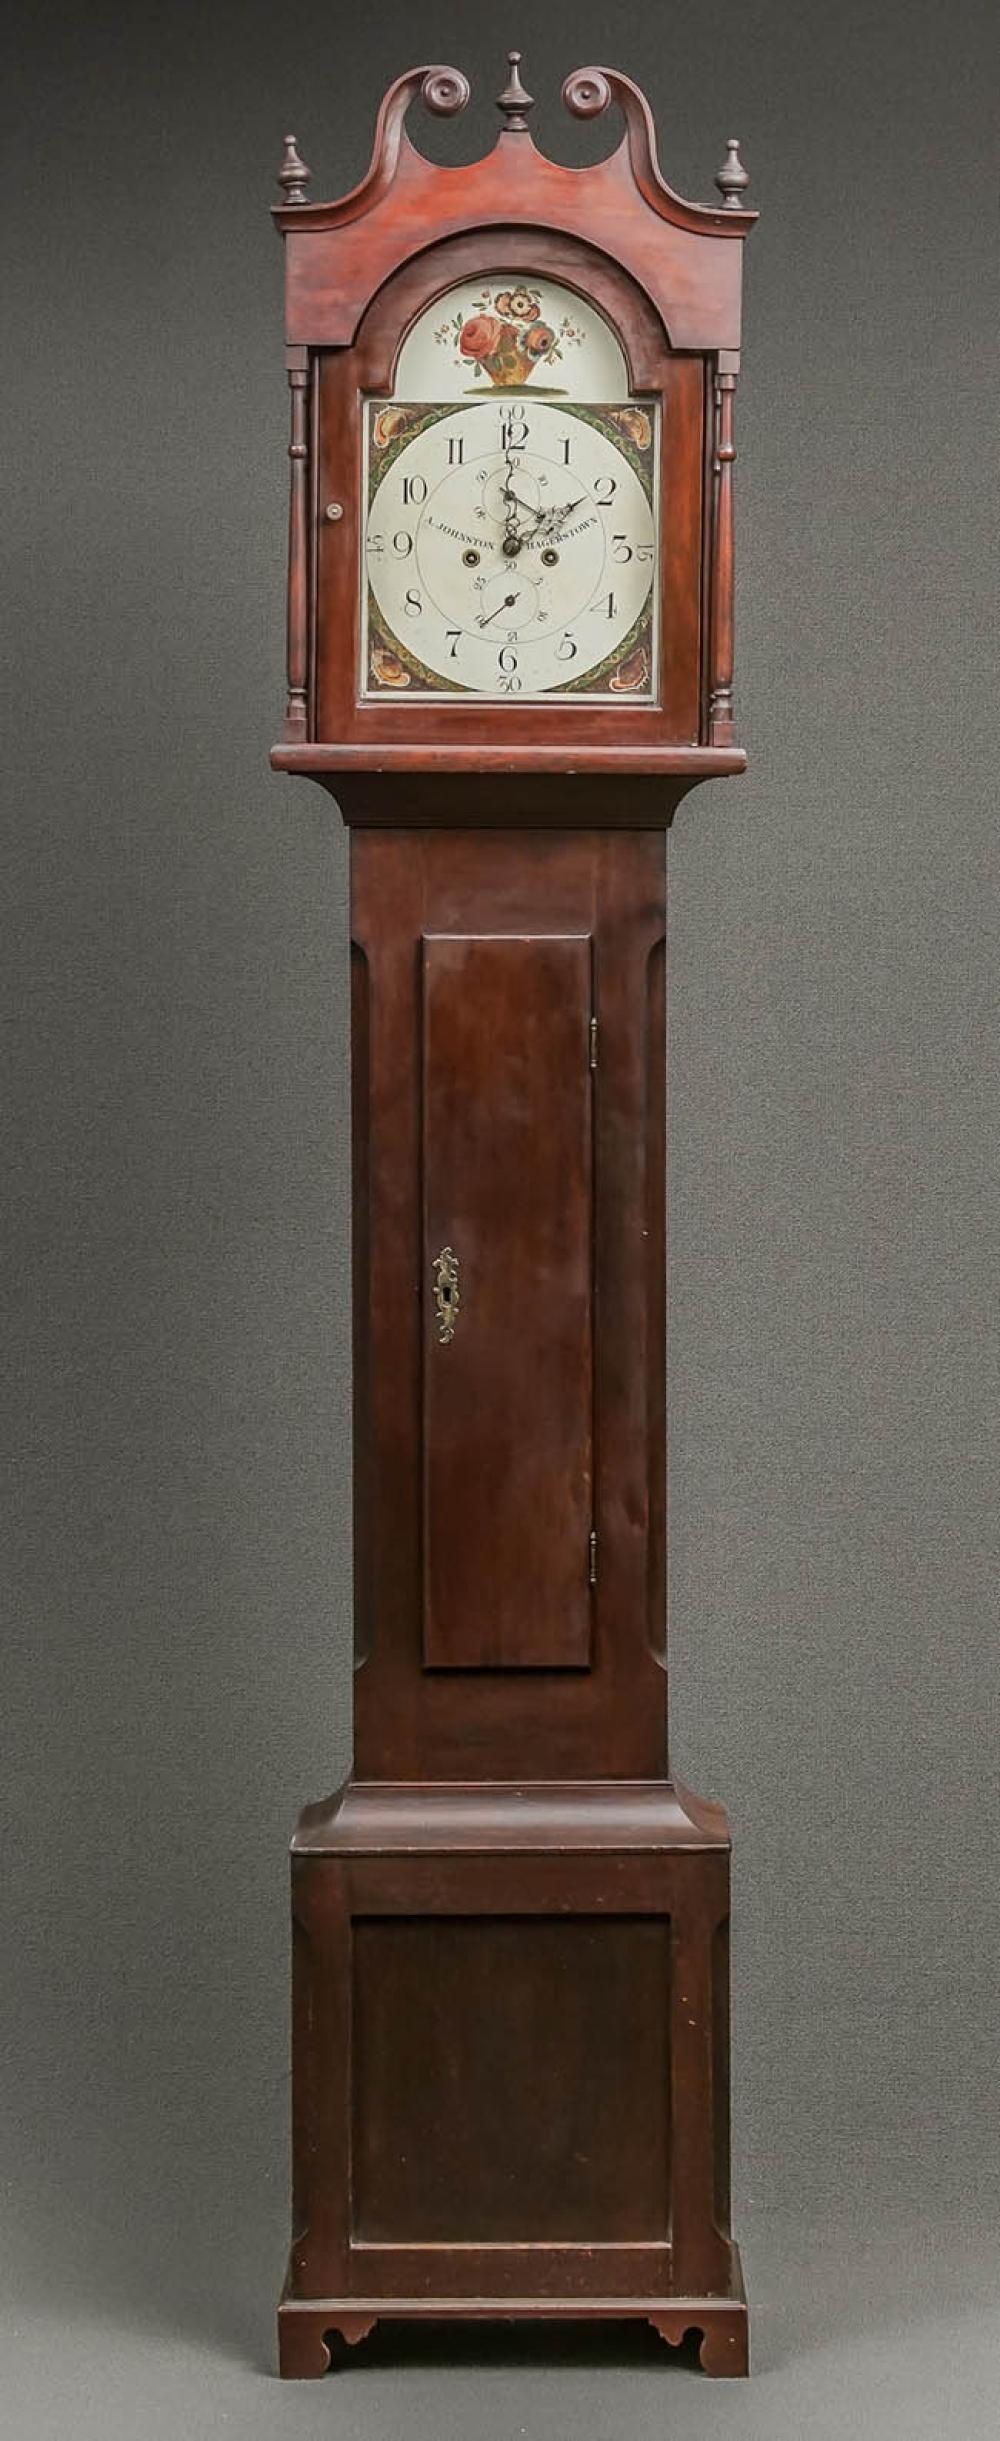 Federal Cherry Tall Case Clock, Arthur Johnston, Hagerstown, Maryland, Circa 1785-1800